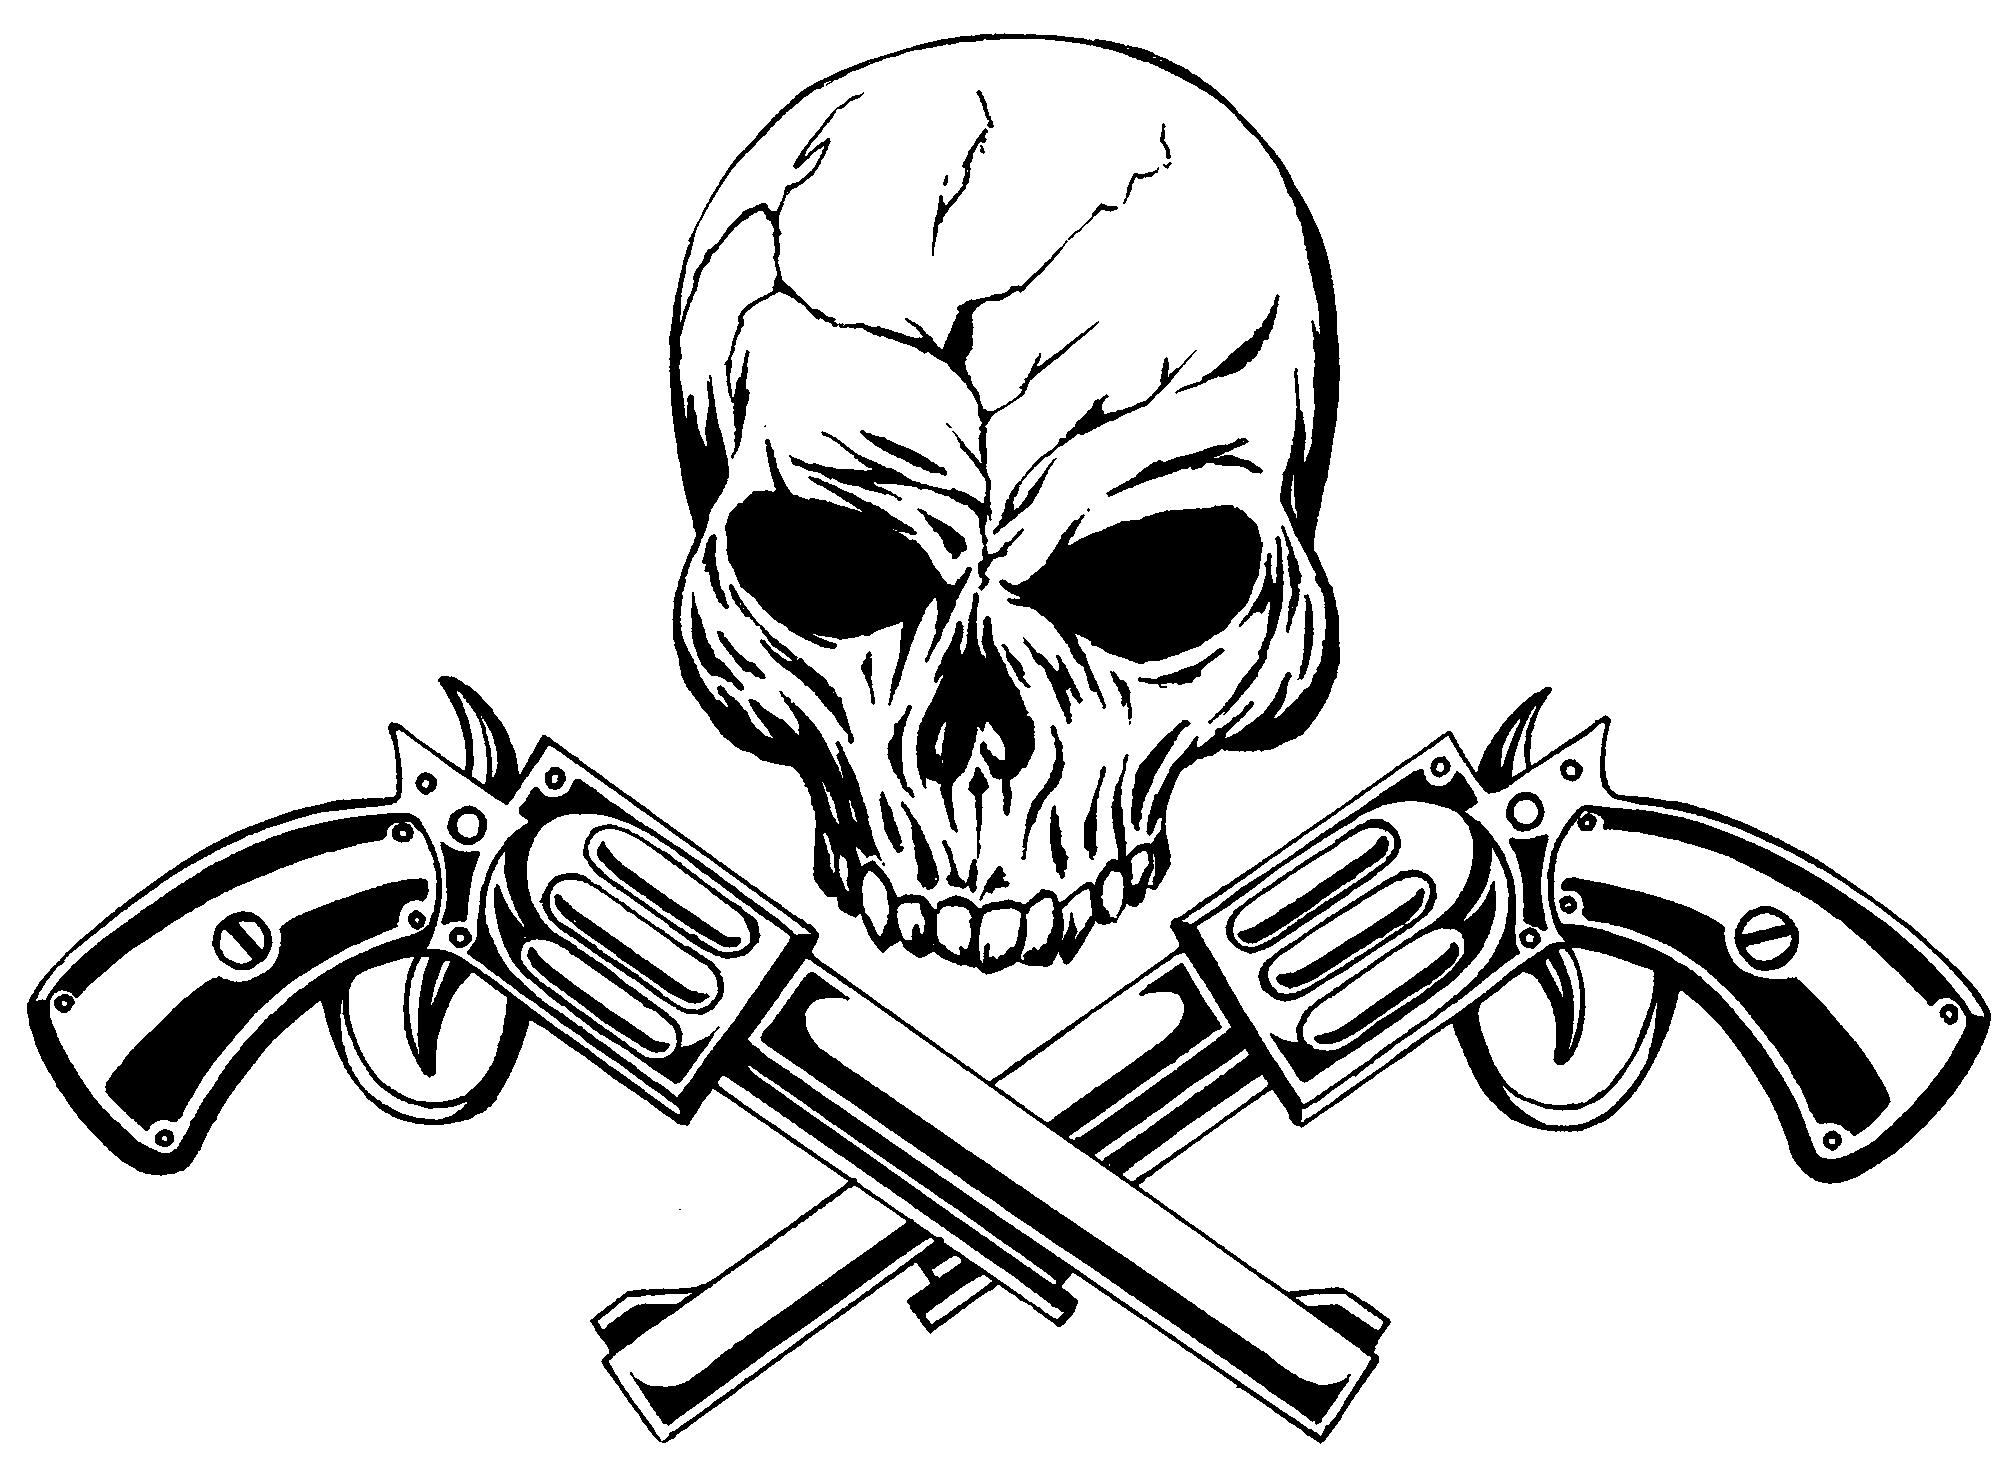 2013x1480 Skull And Guns By Manu17acdc